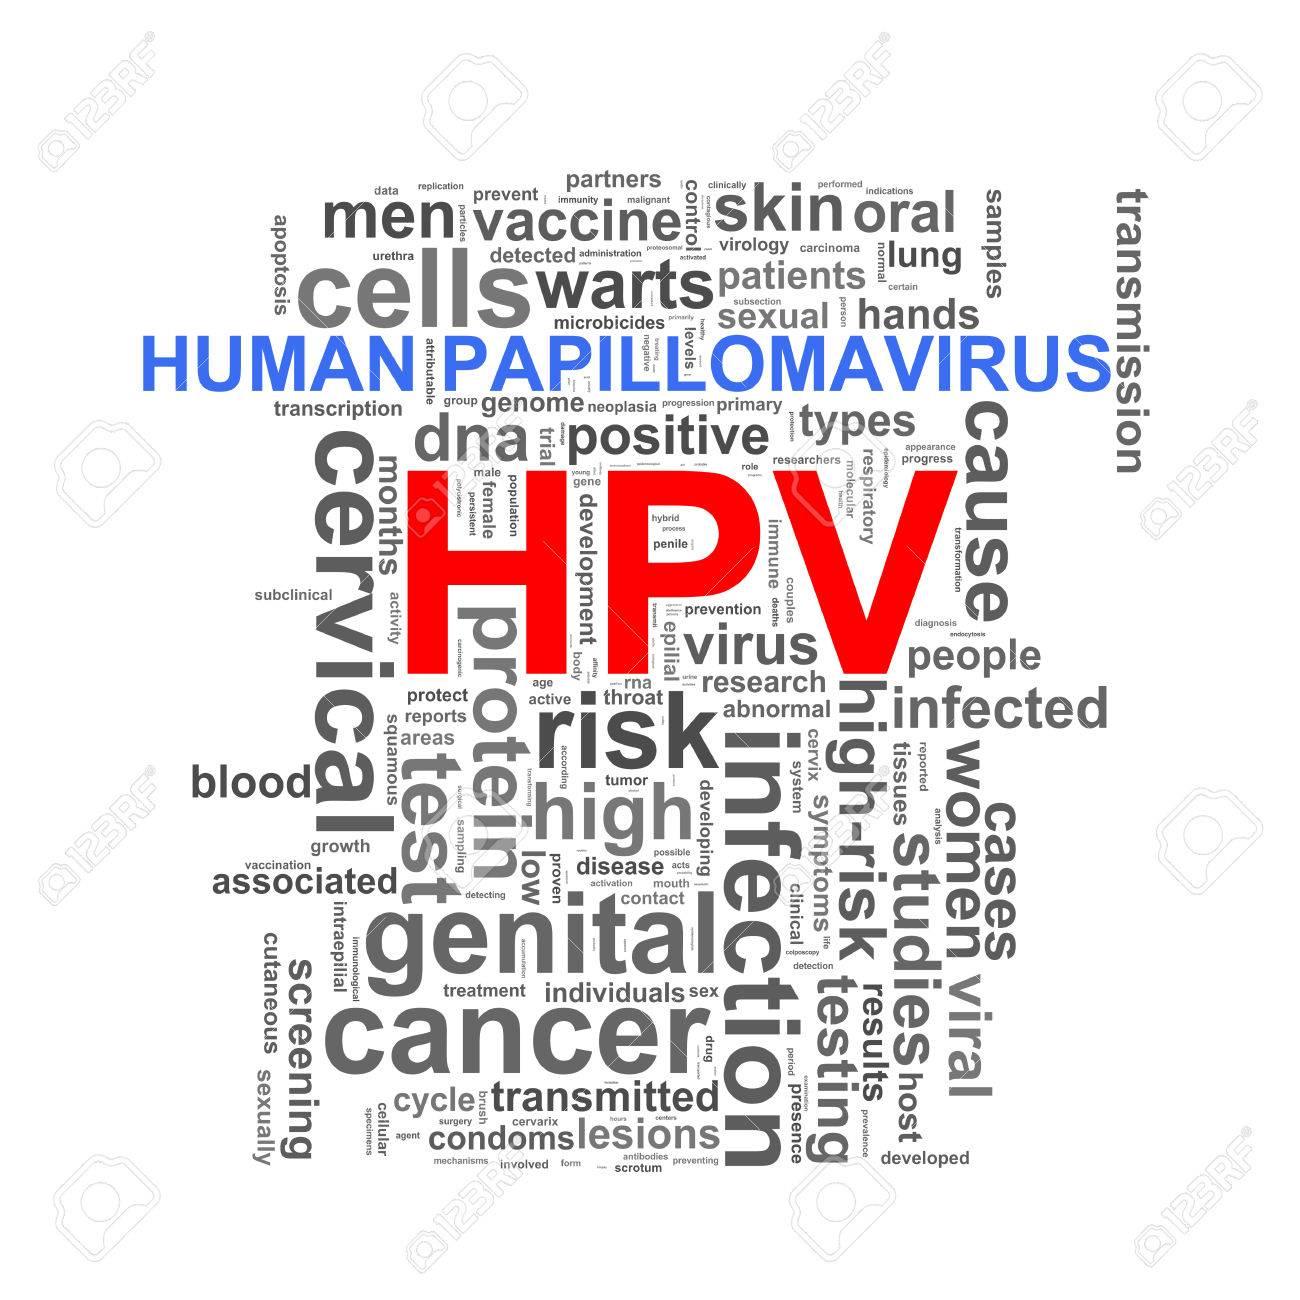 virus del papiloma humano word hpv cancer strain